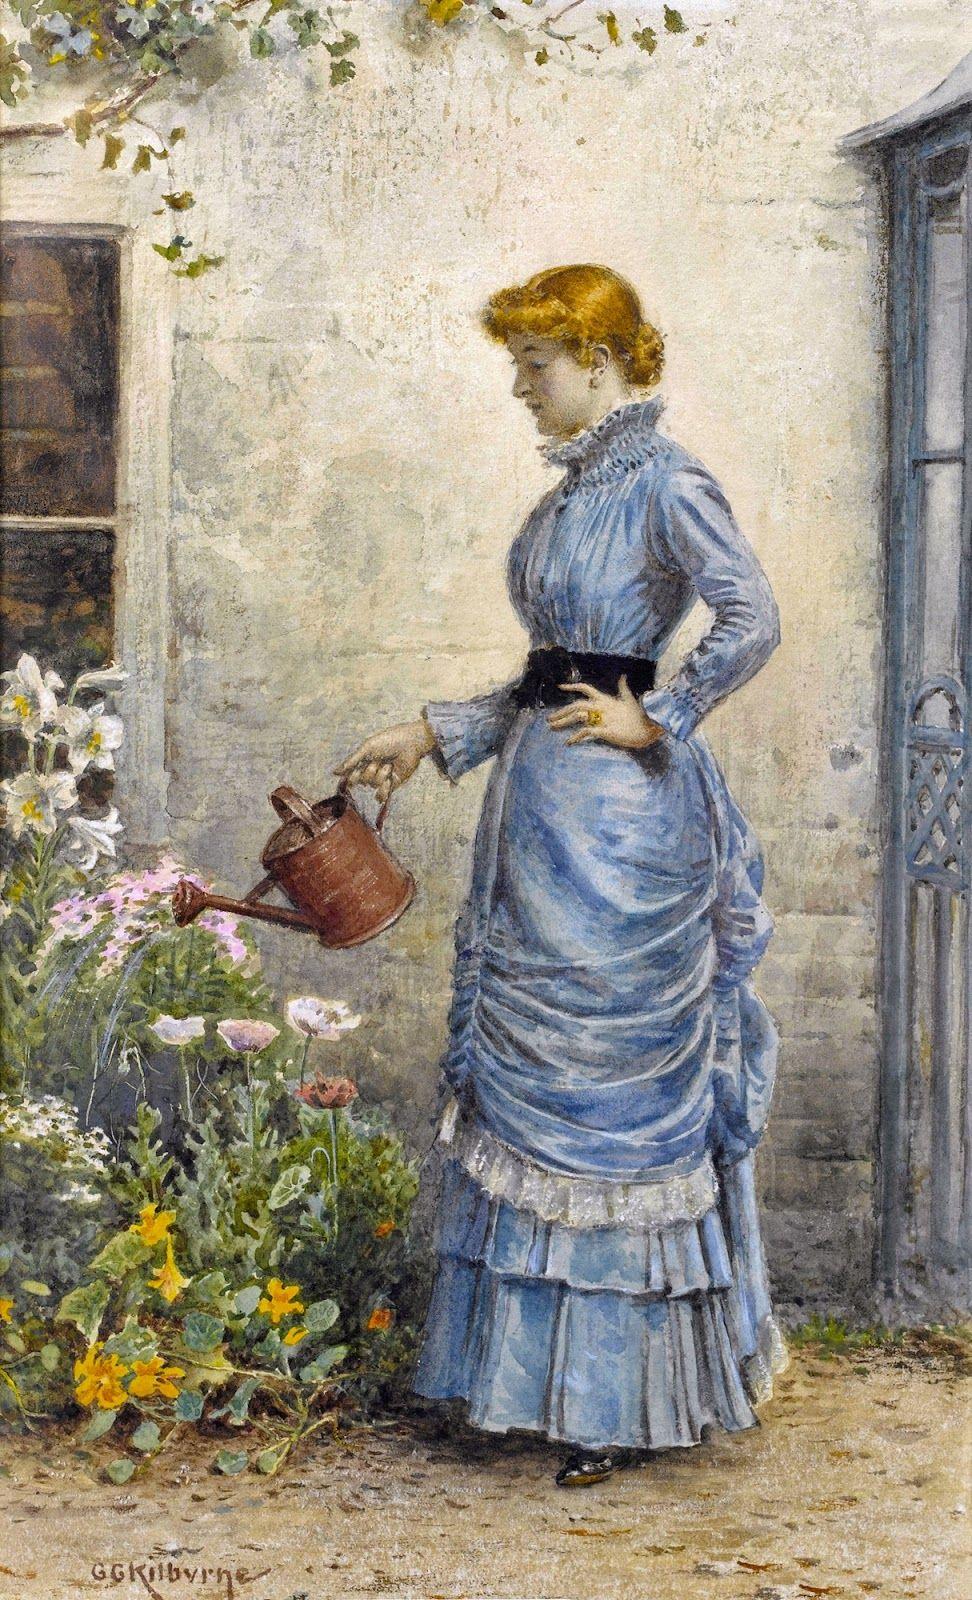 Victorian British Painting: George Goodwin Kilburne, ctd 19thcenturybritpaint.blogspot.com972 × 1600Buscar por imagen Watering the Flowers Jane Maria Bowkett - Buscar con Google